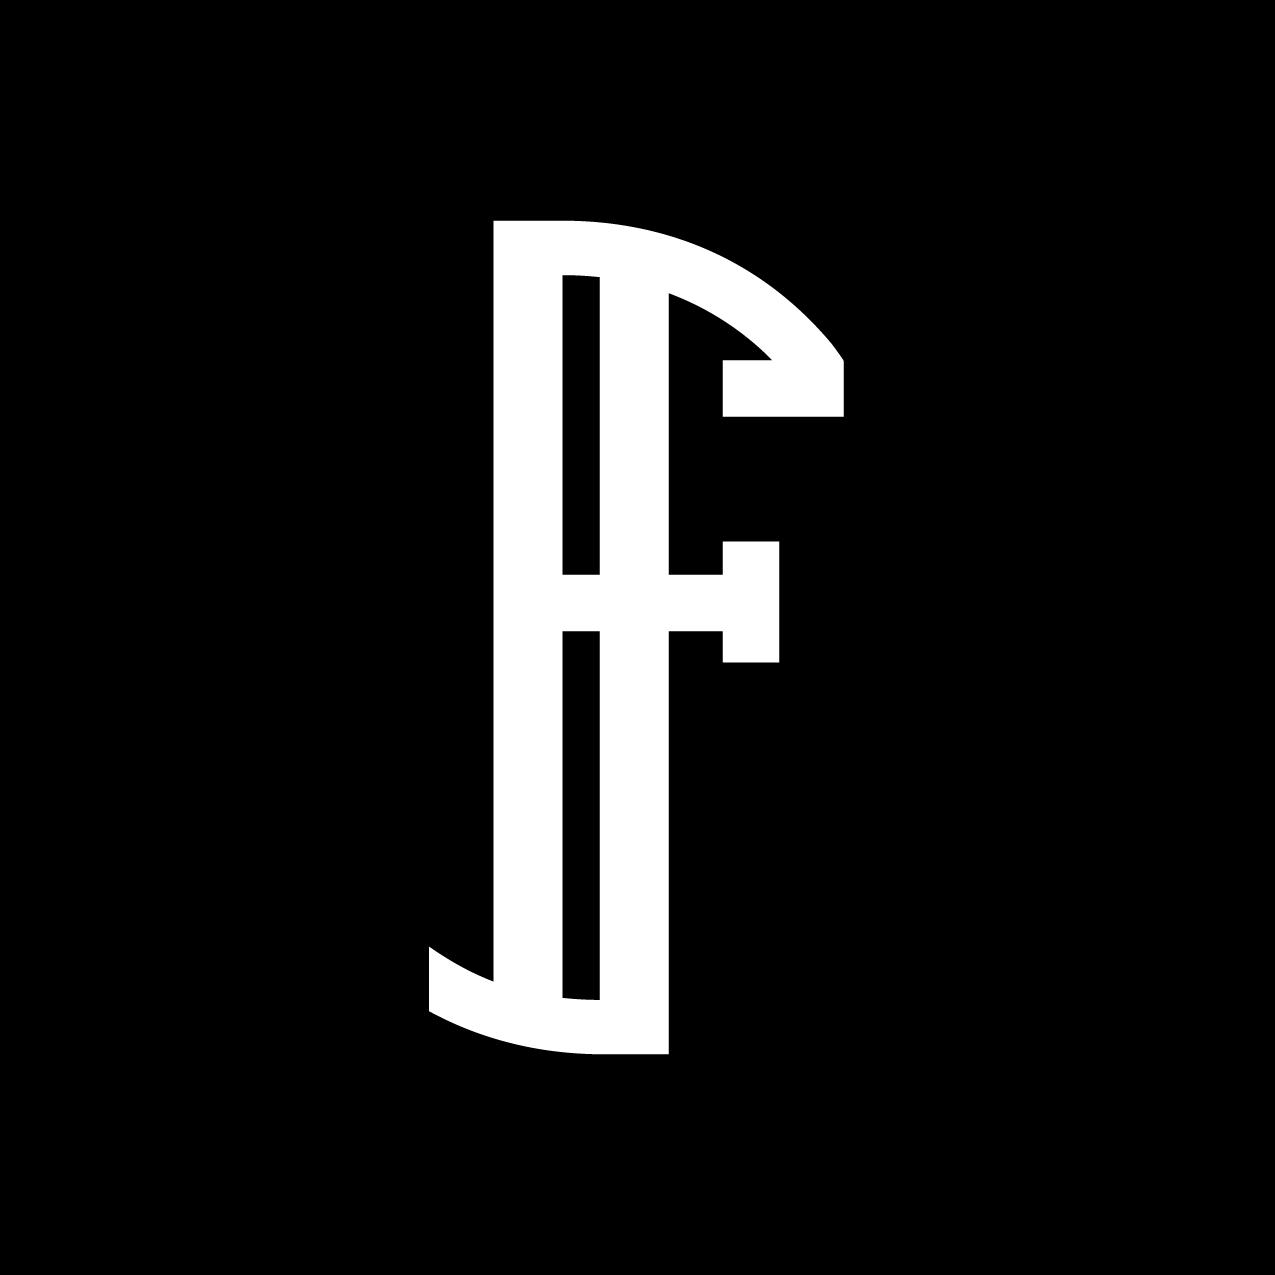 Letter F11 design by Furia